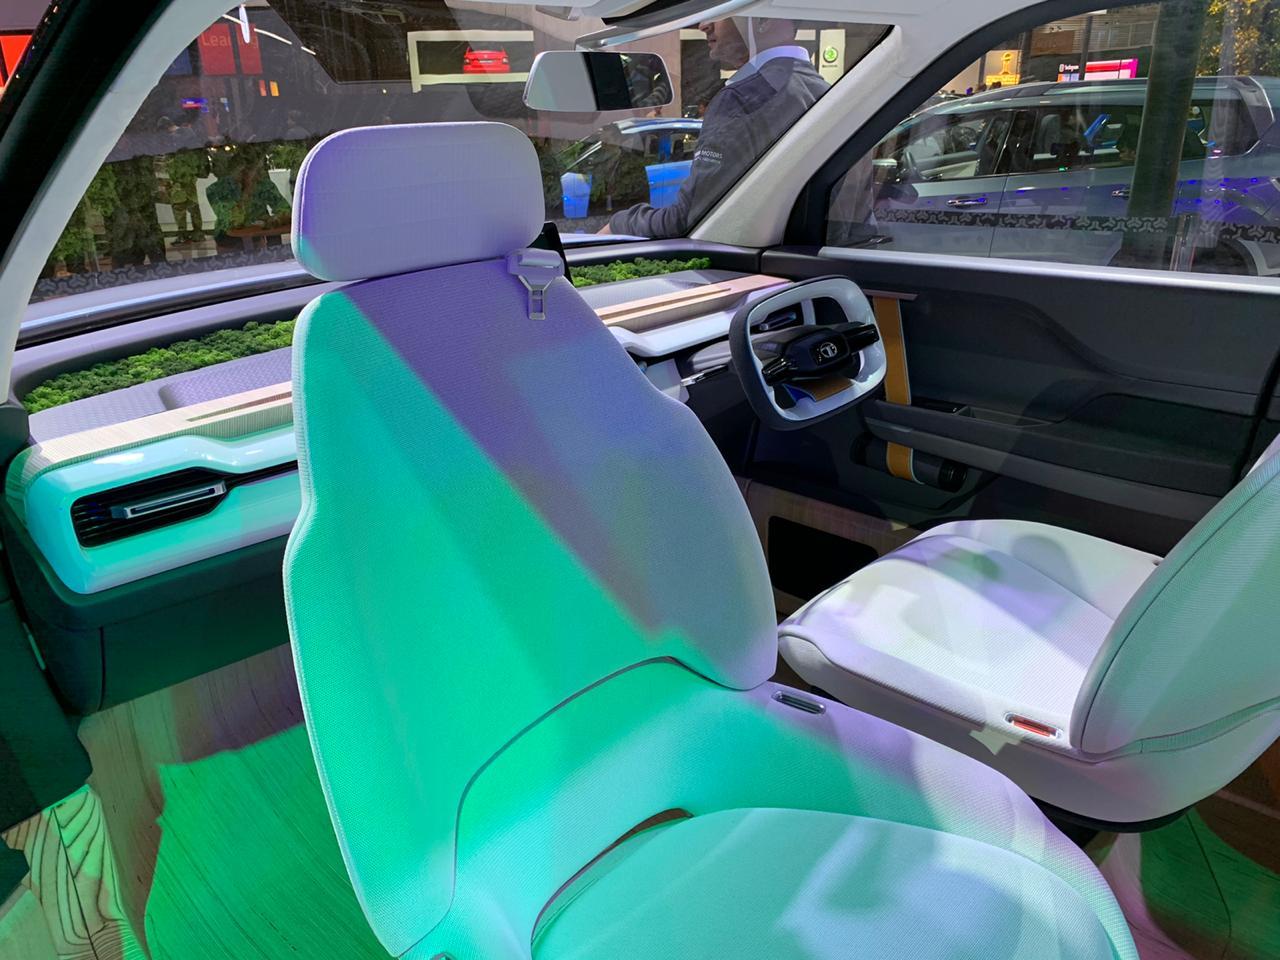 Tata Sierra EV Concept interiors - Auto Expo 2020 (1)